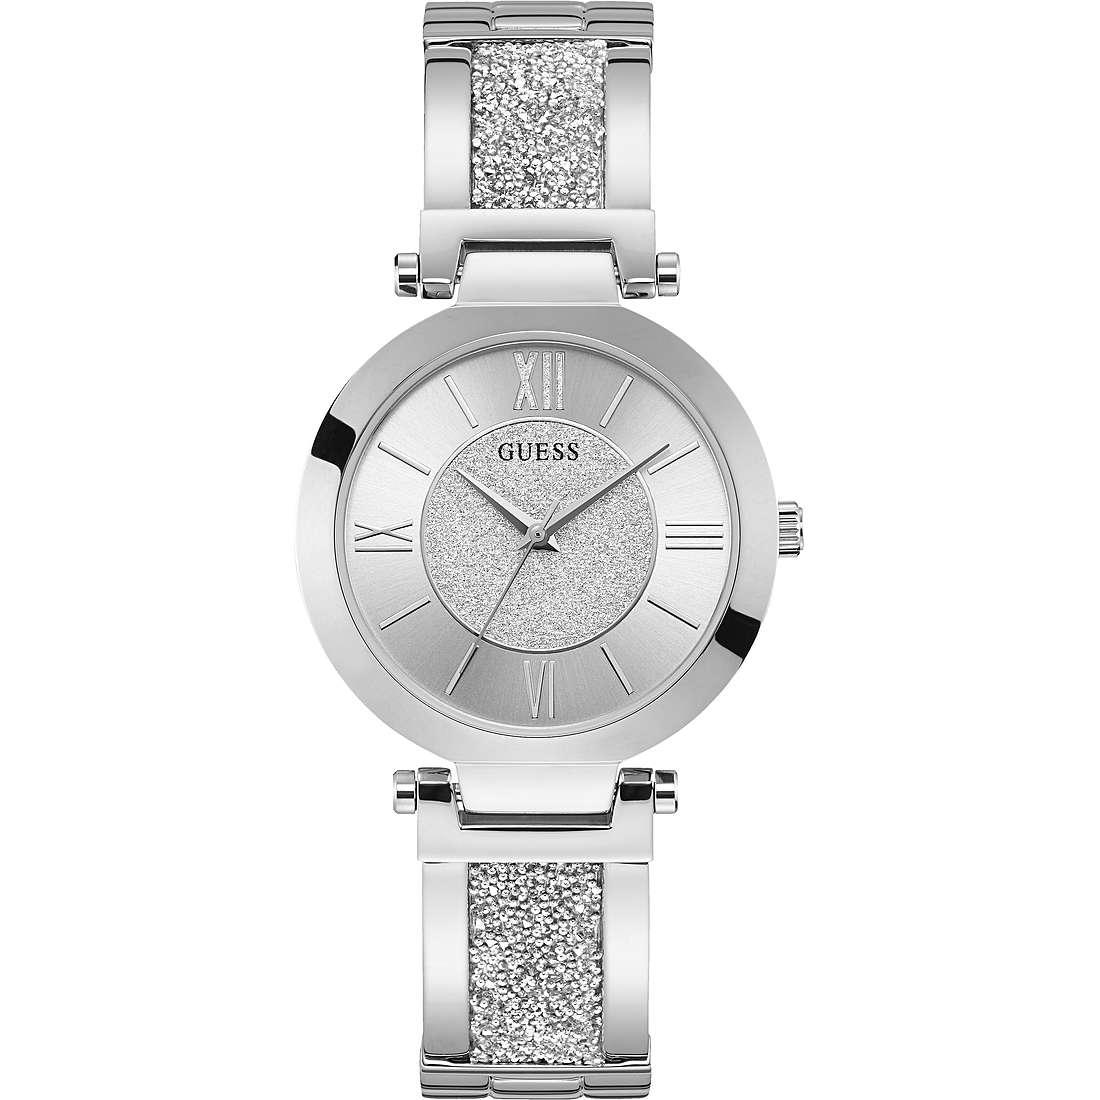 Guess Ladies Trend Orologio Silver Donna Argento Borse